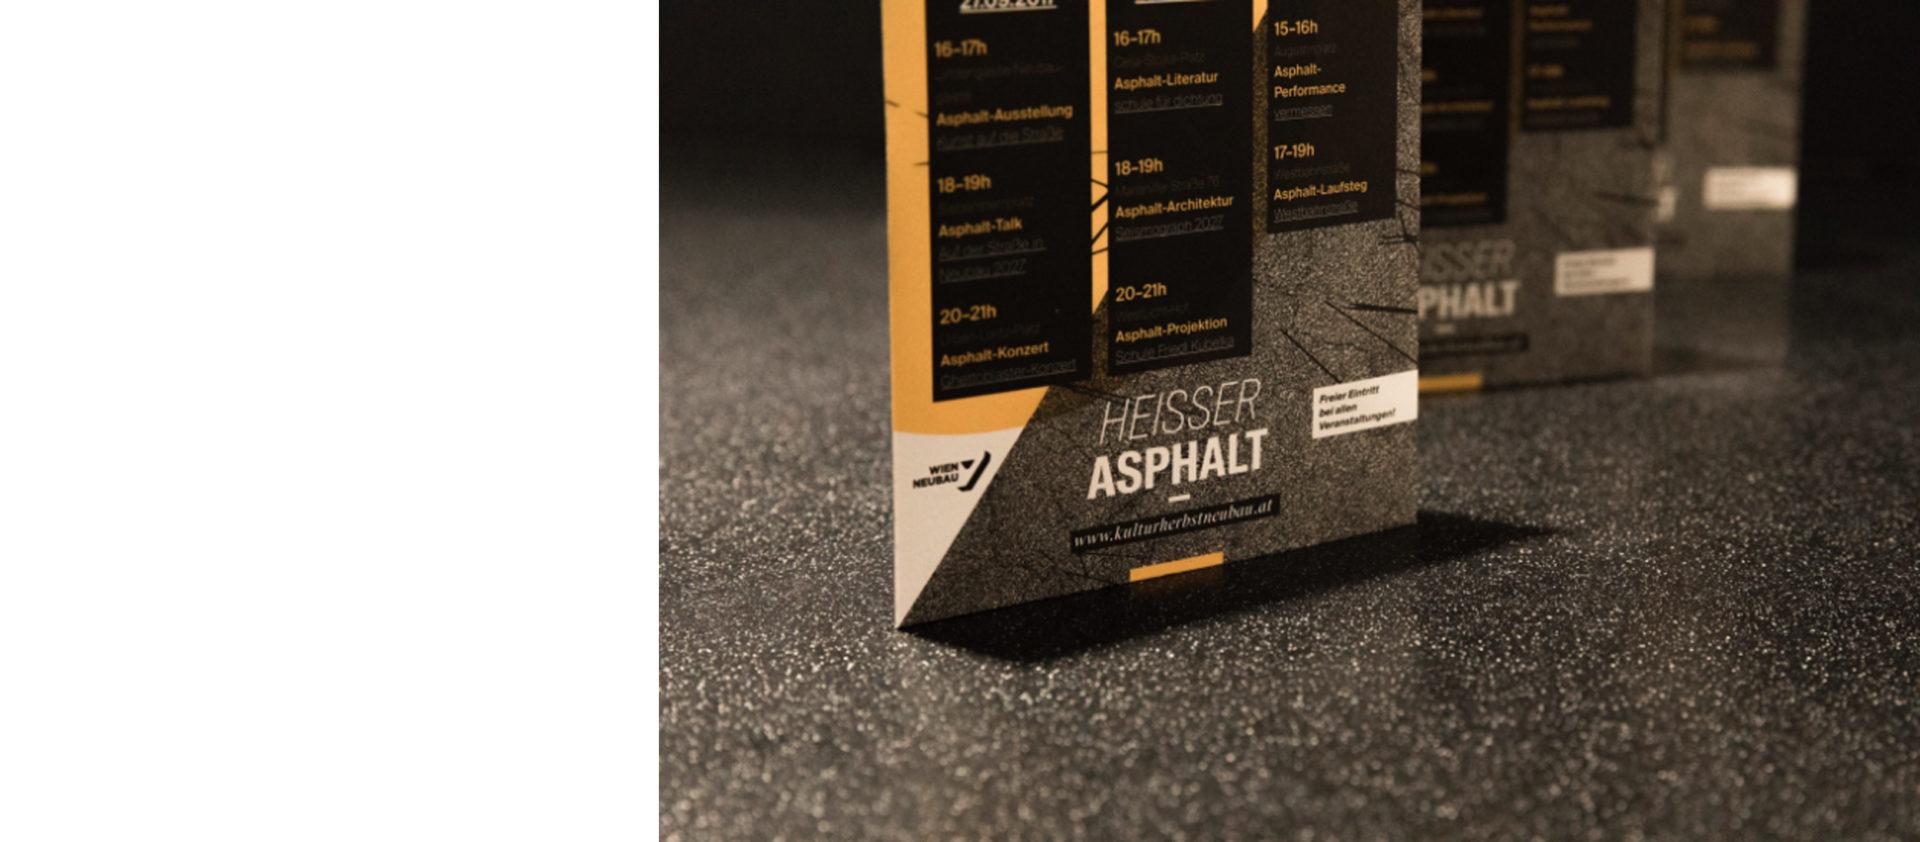 VALENCE ASPHALT Q 03